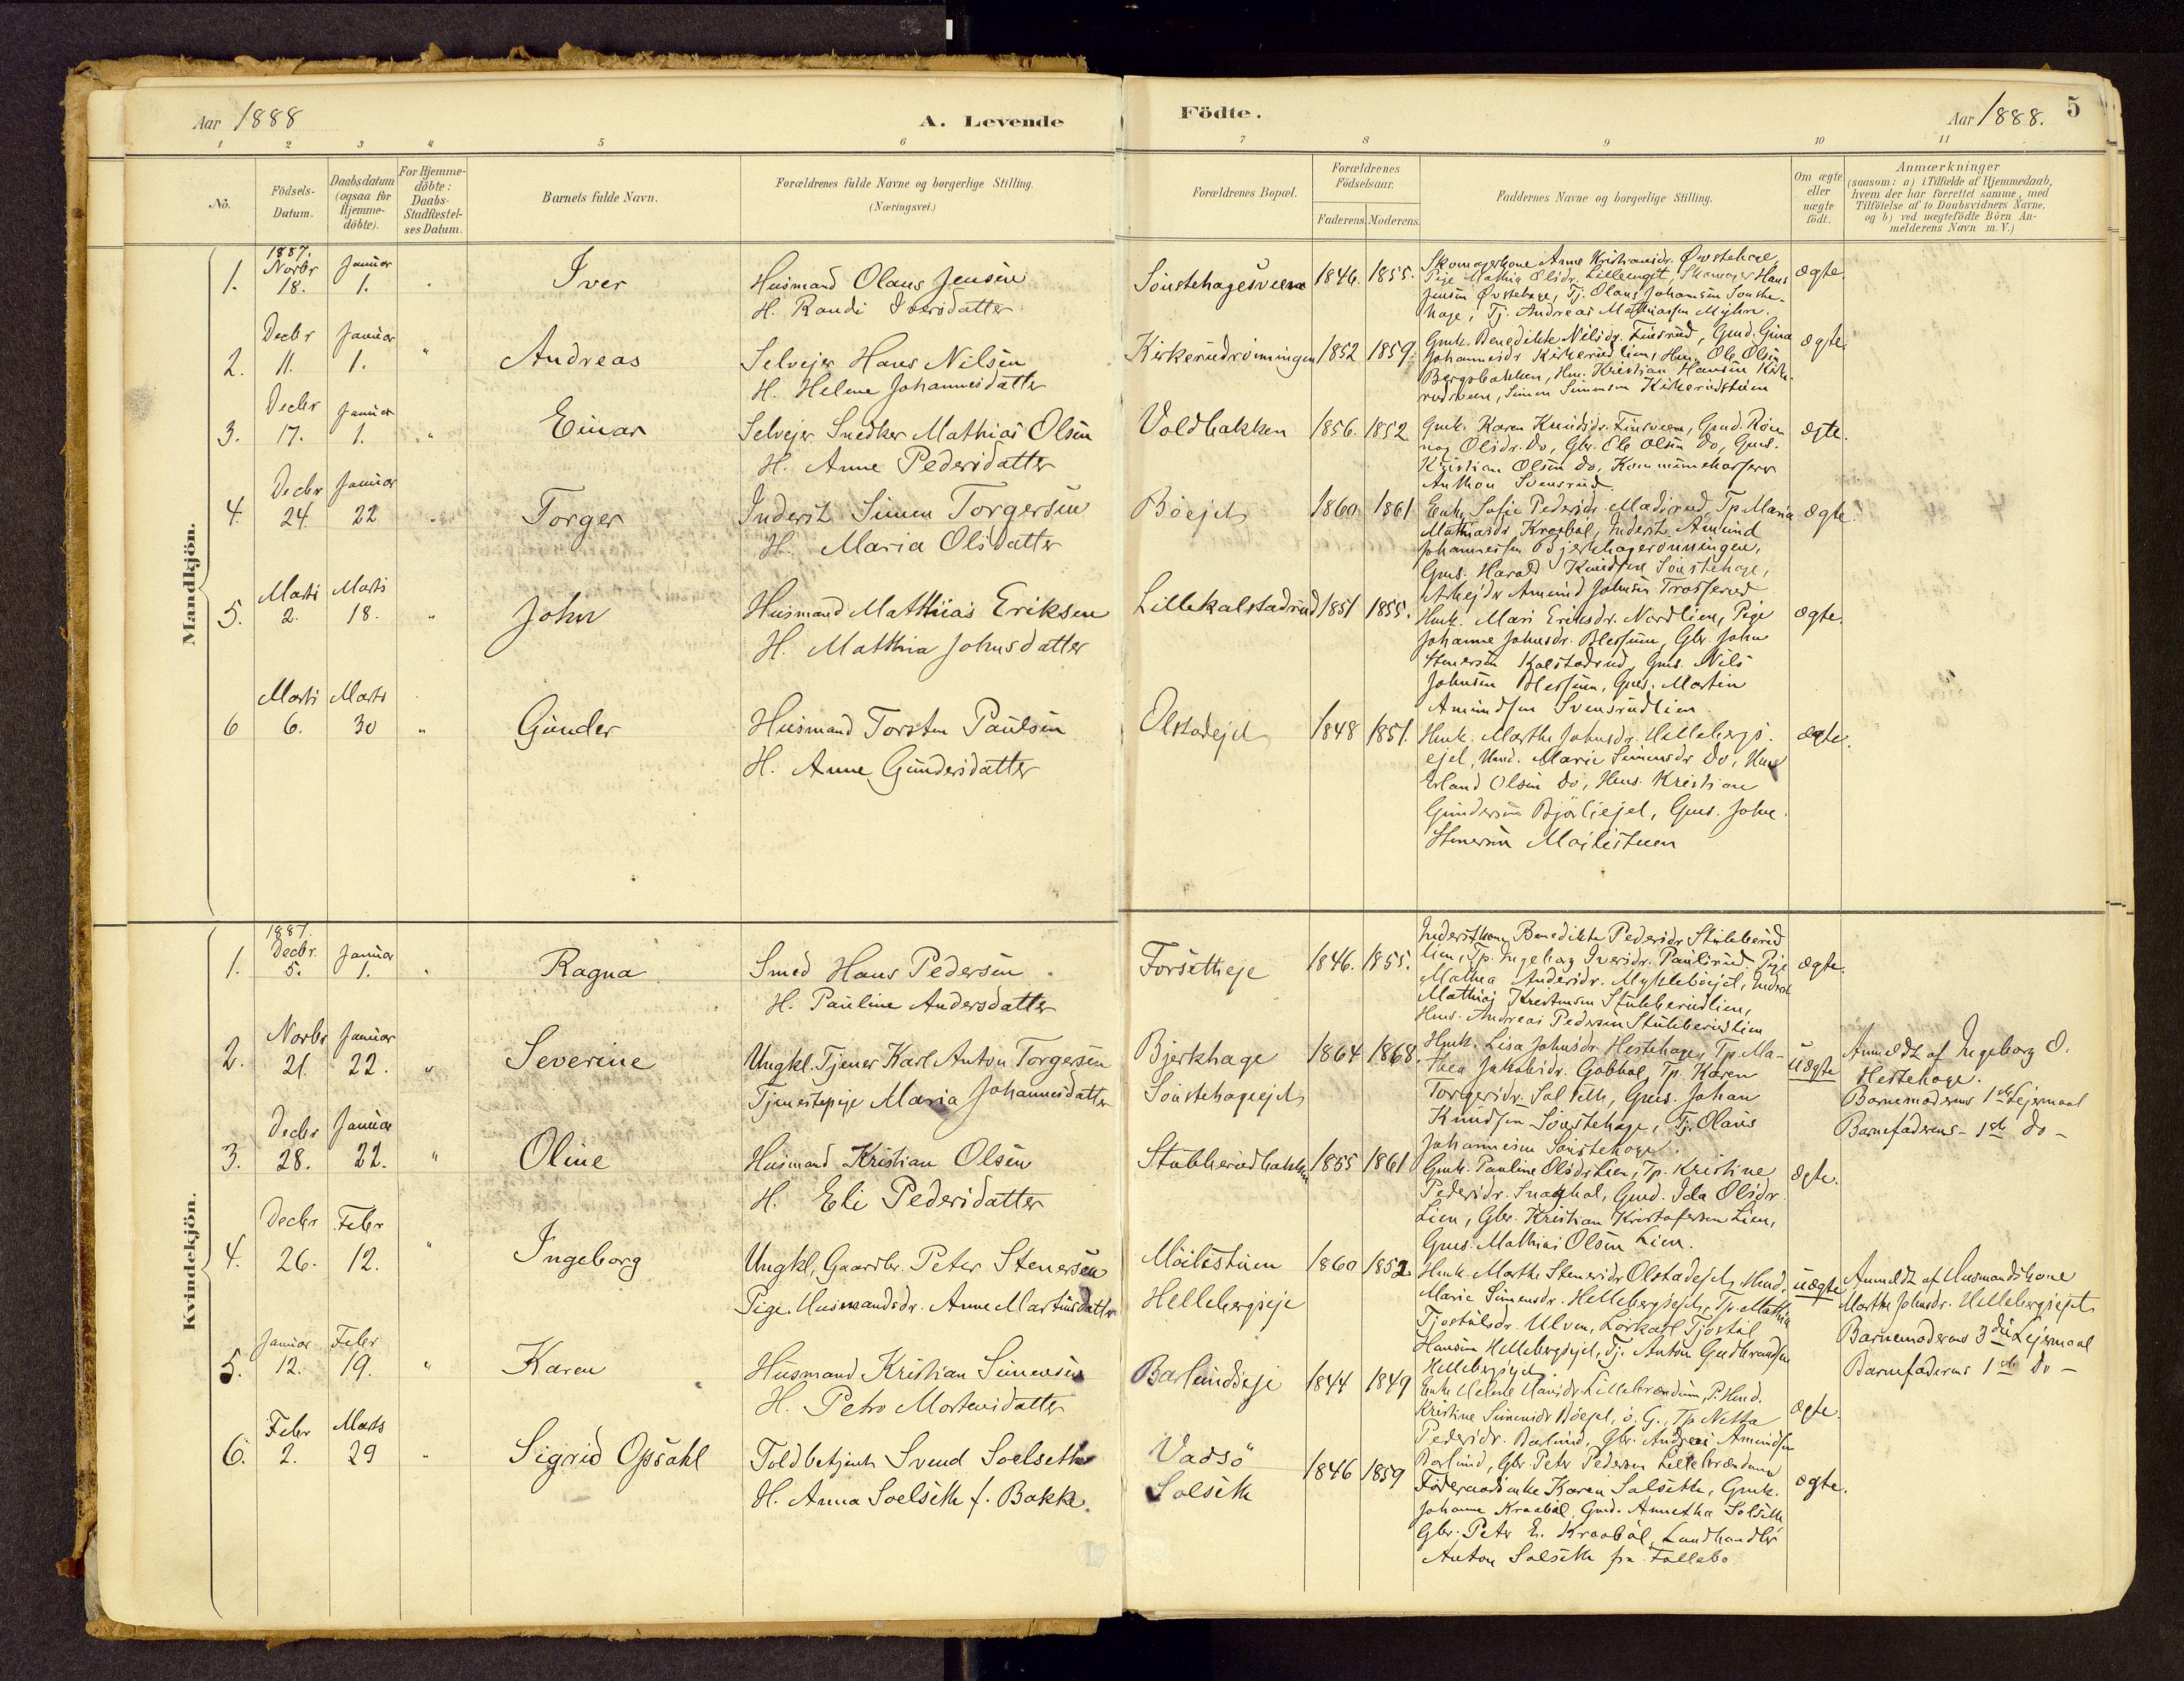 SAH, Vestre Gausdal prestekontor, Ministerialbok nr. 1, 1887-1914, s. 5